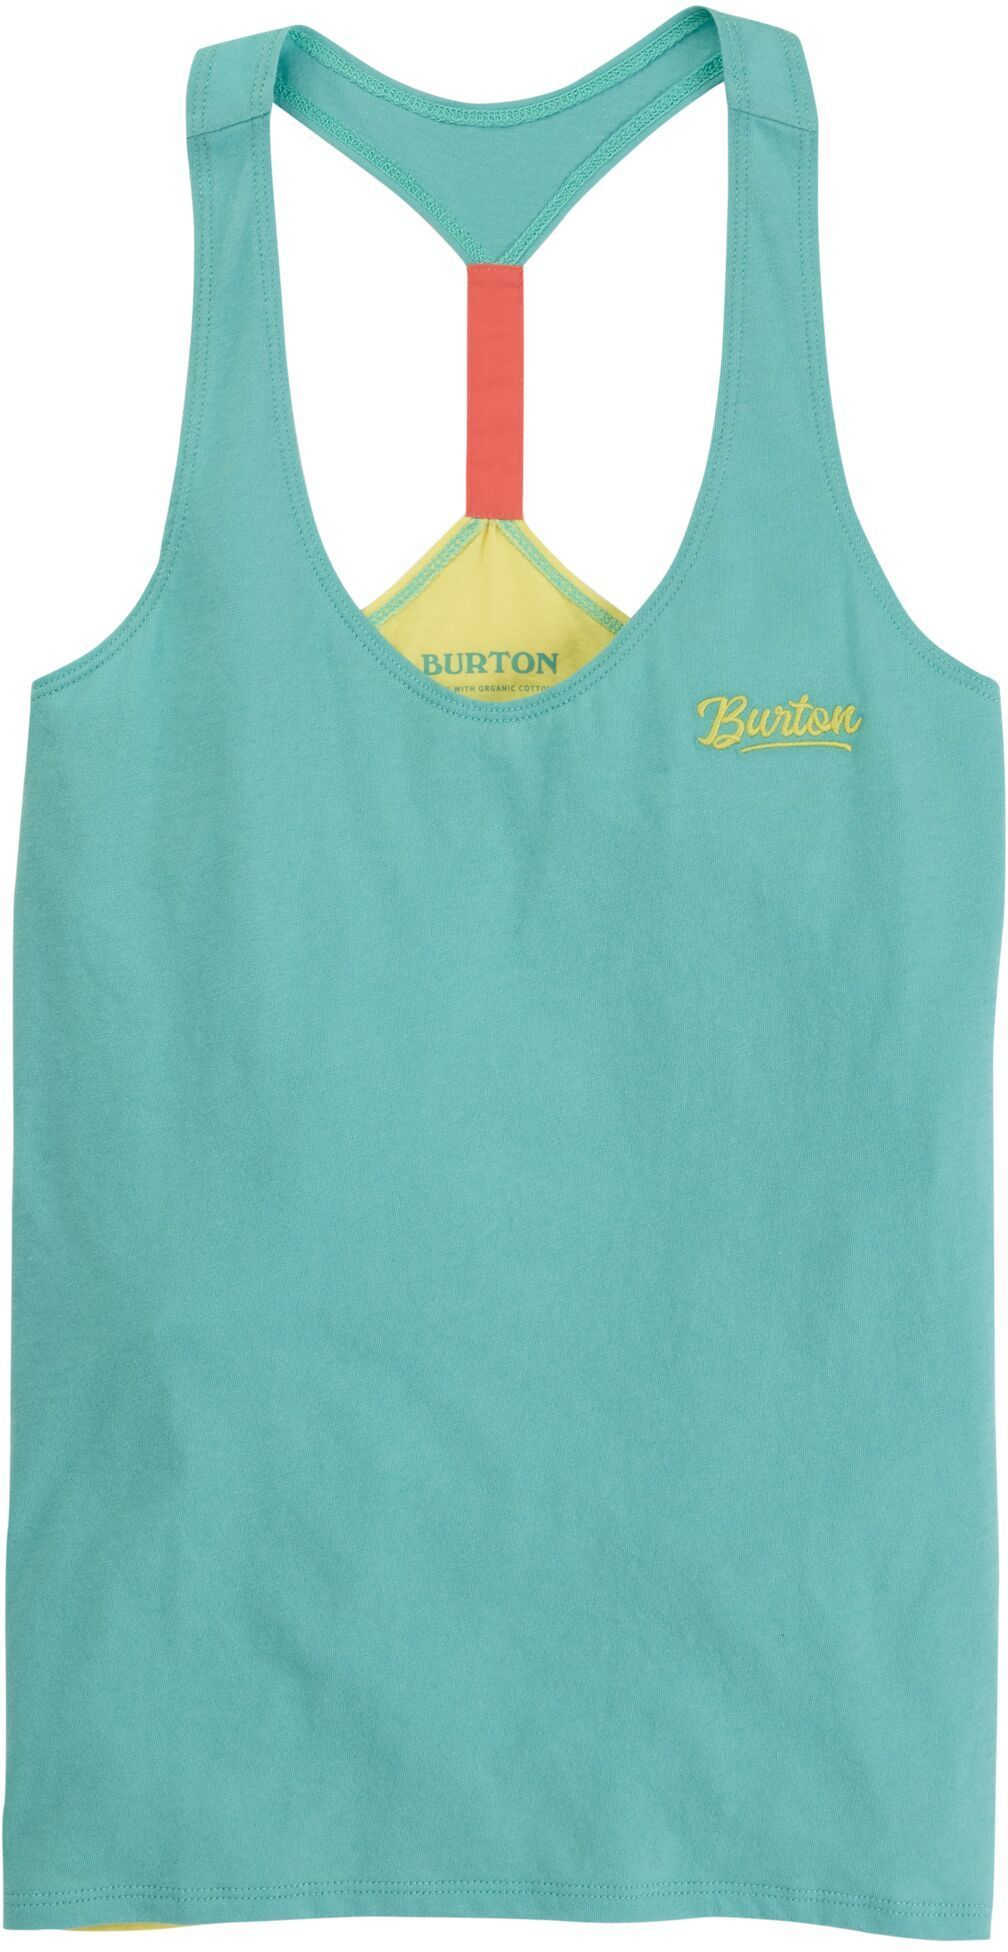 top damski BURTON BALTRA TANK Buoy Blue/Lemon Verbena